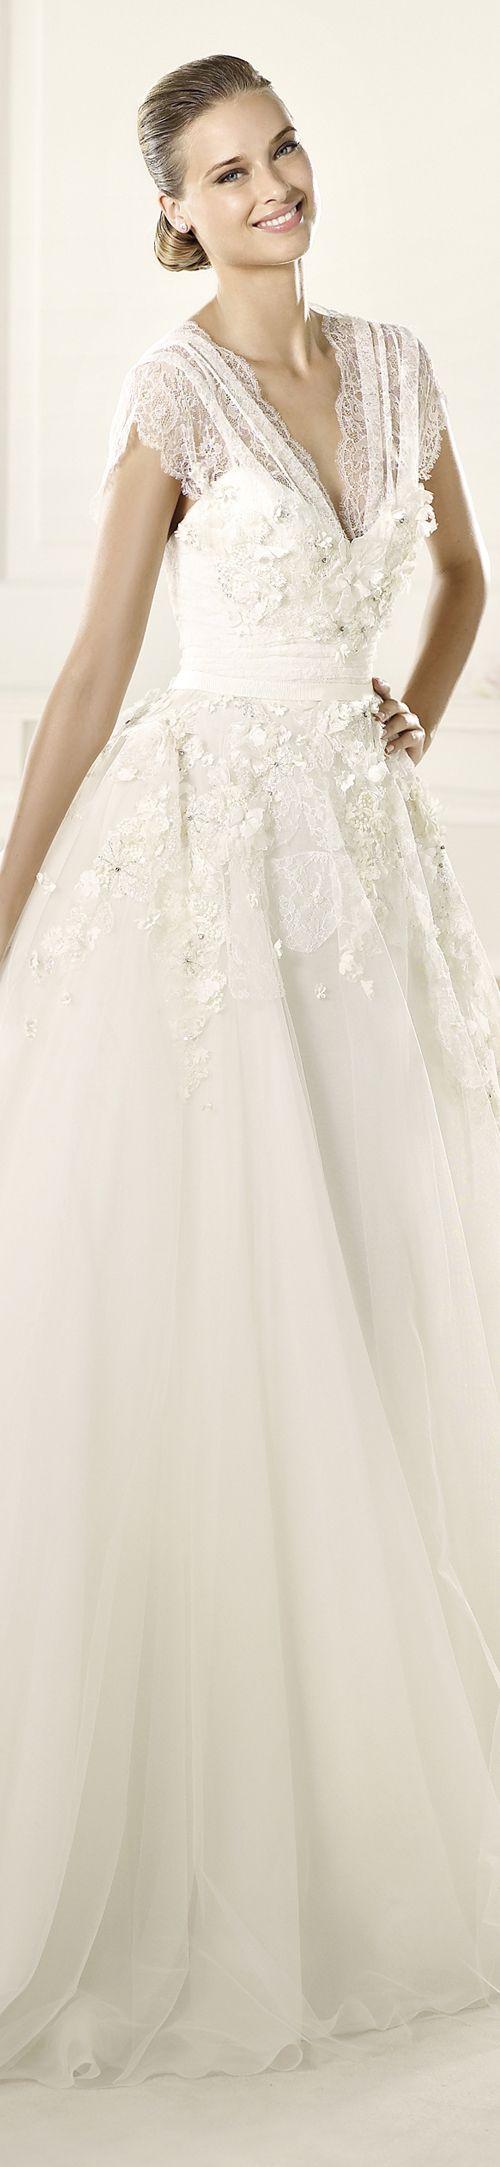 "Elie by Elie Saab for Pronovias wedding dress ""Denisse"", 2013 Collections."